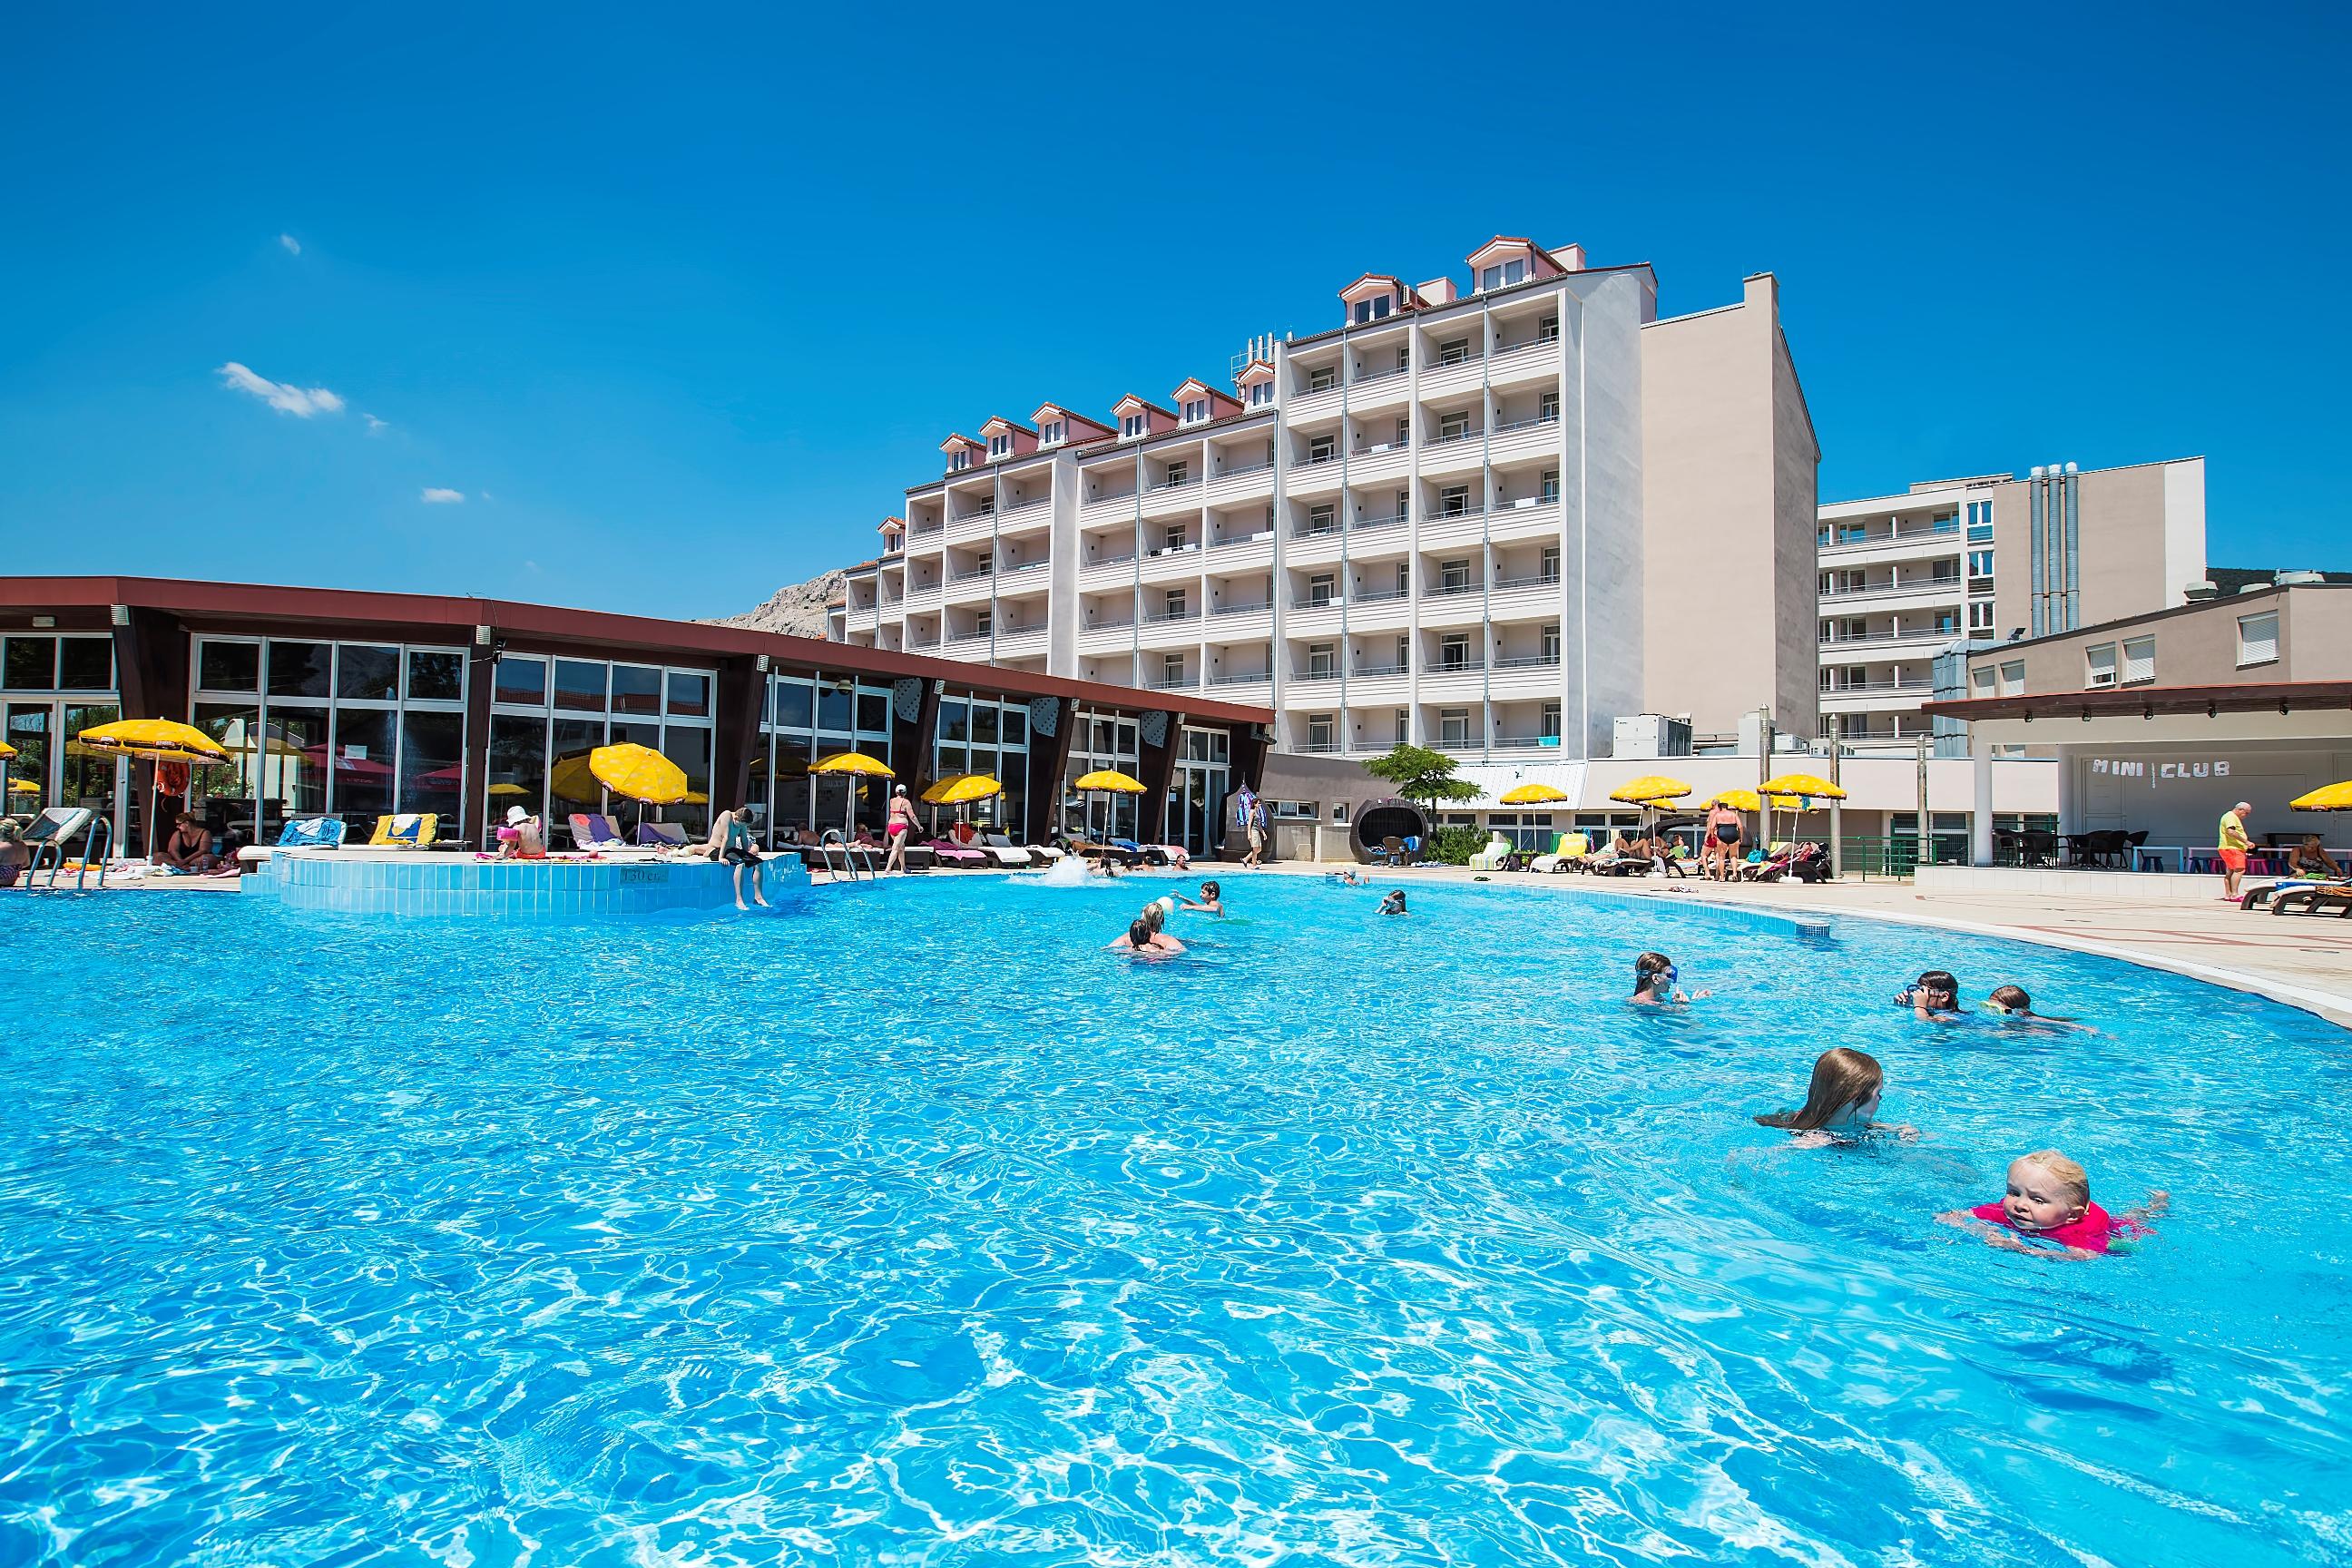 Hotel_Corinthia_-_Baška_1